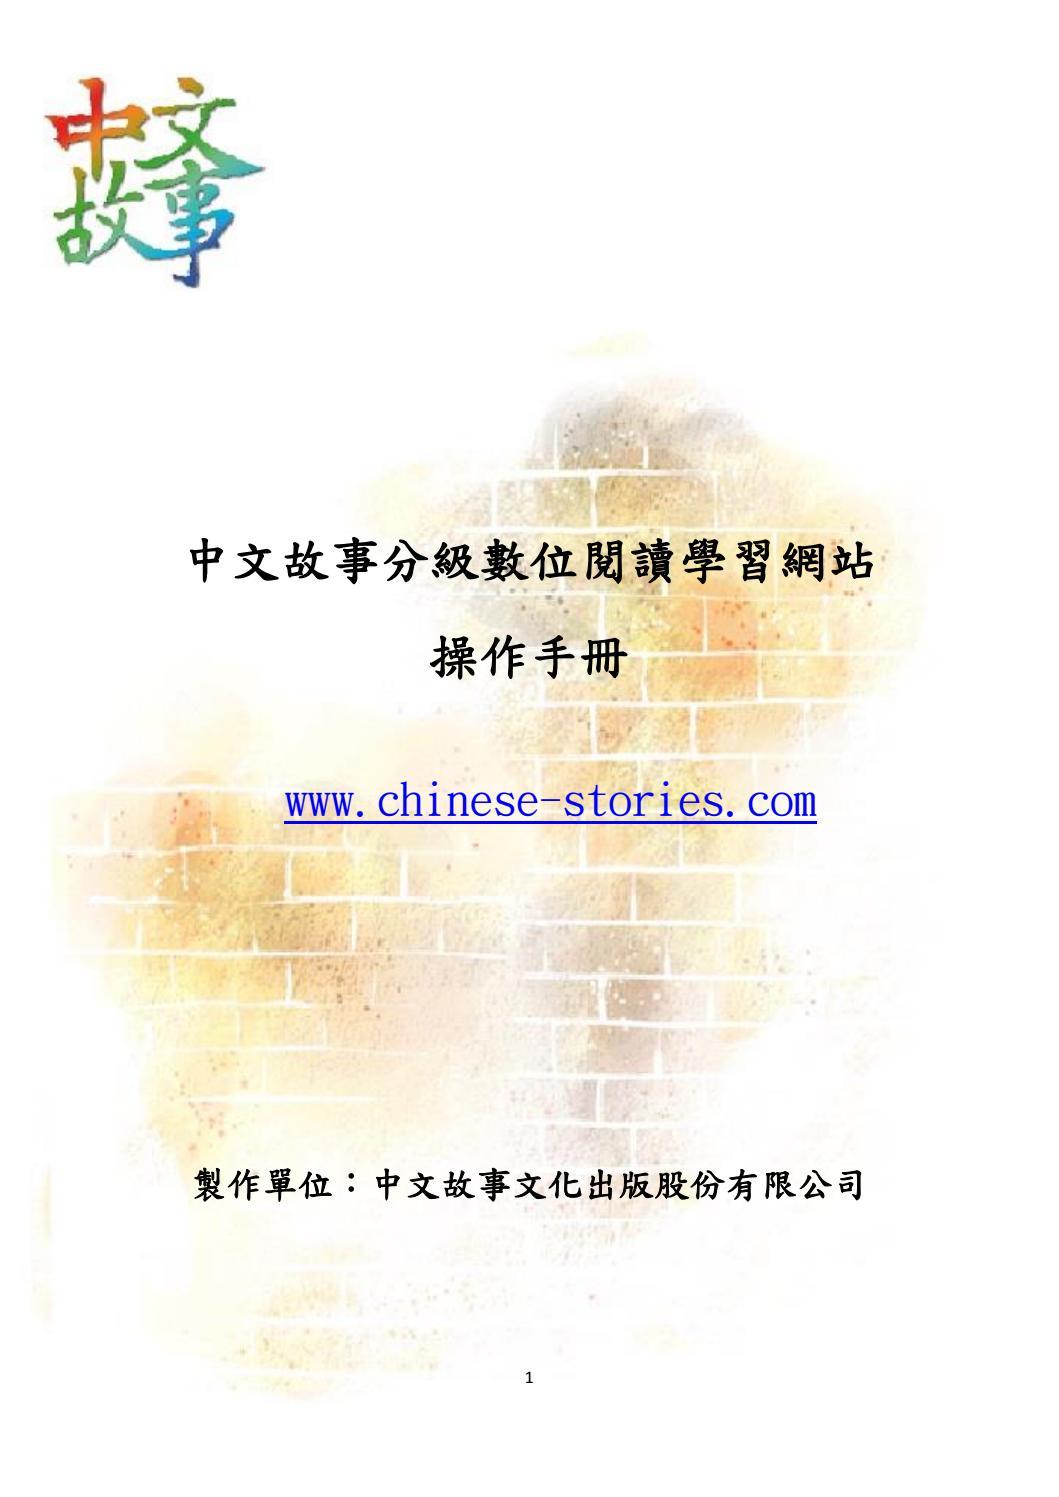 Chinese-stories Operating Manuals中文故事分級數位閱讀學習網站操作手冊繁體 by 中文故事Chinese-Stories - Issuu